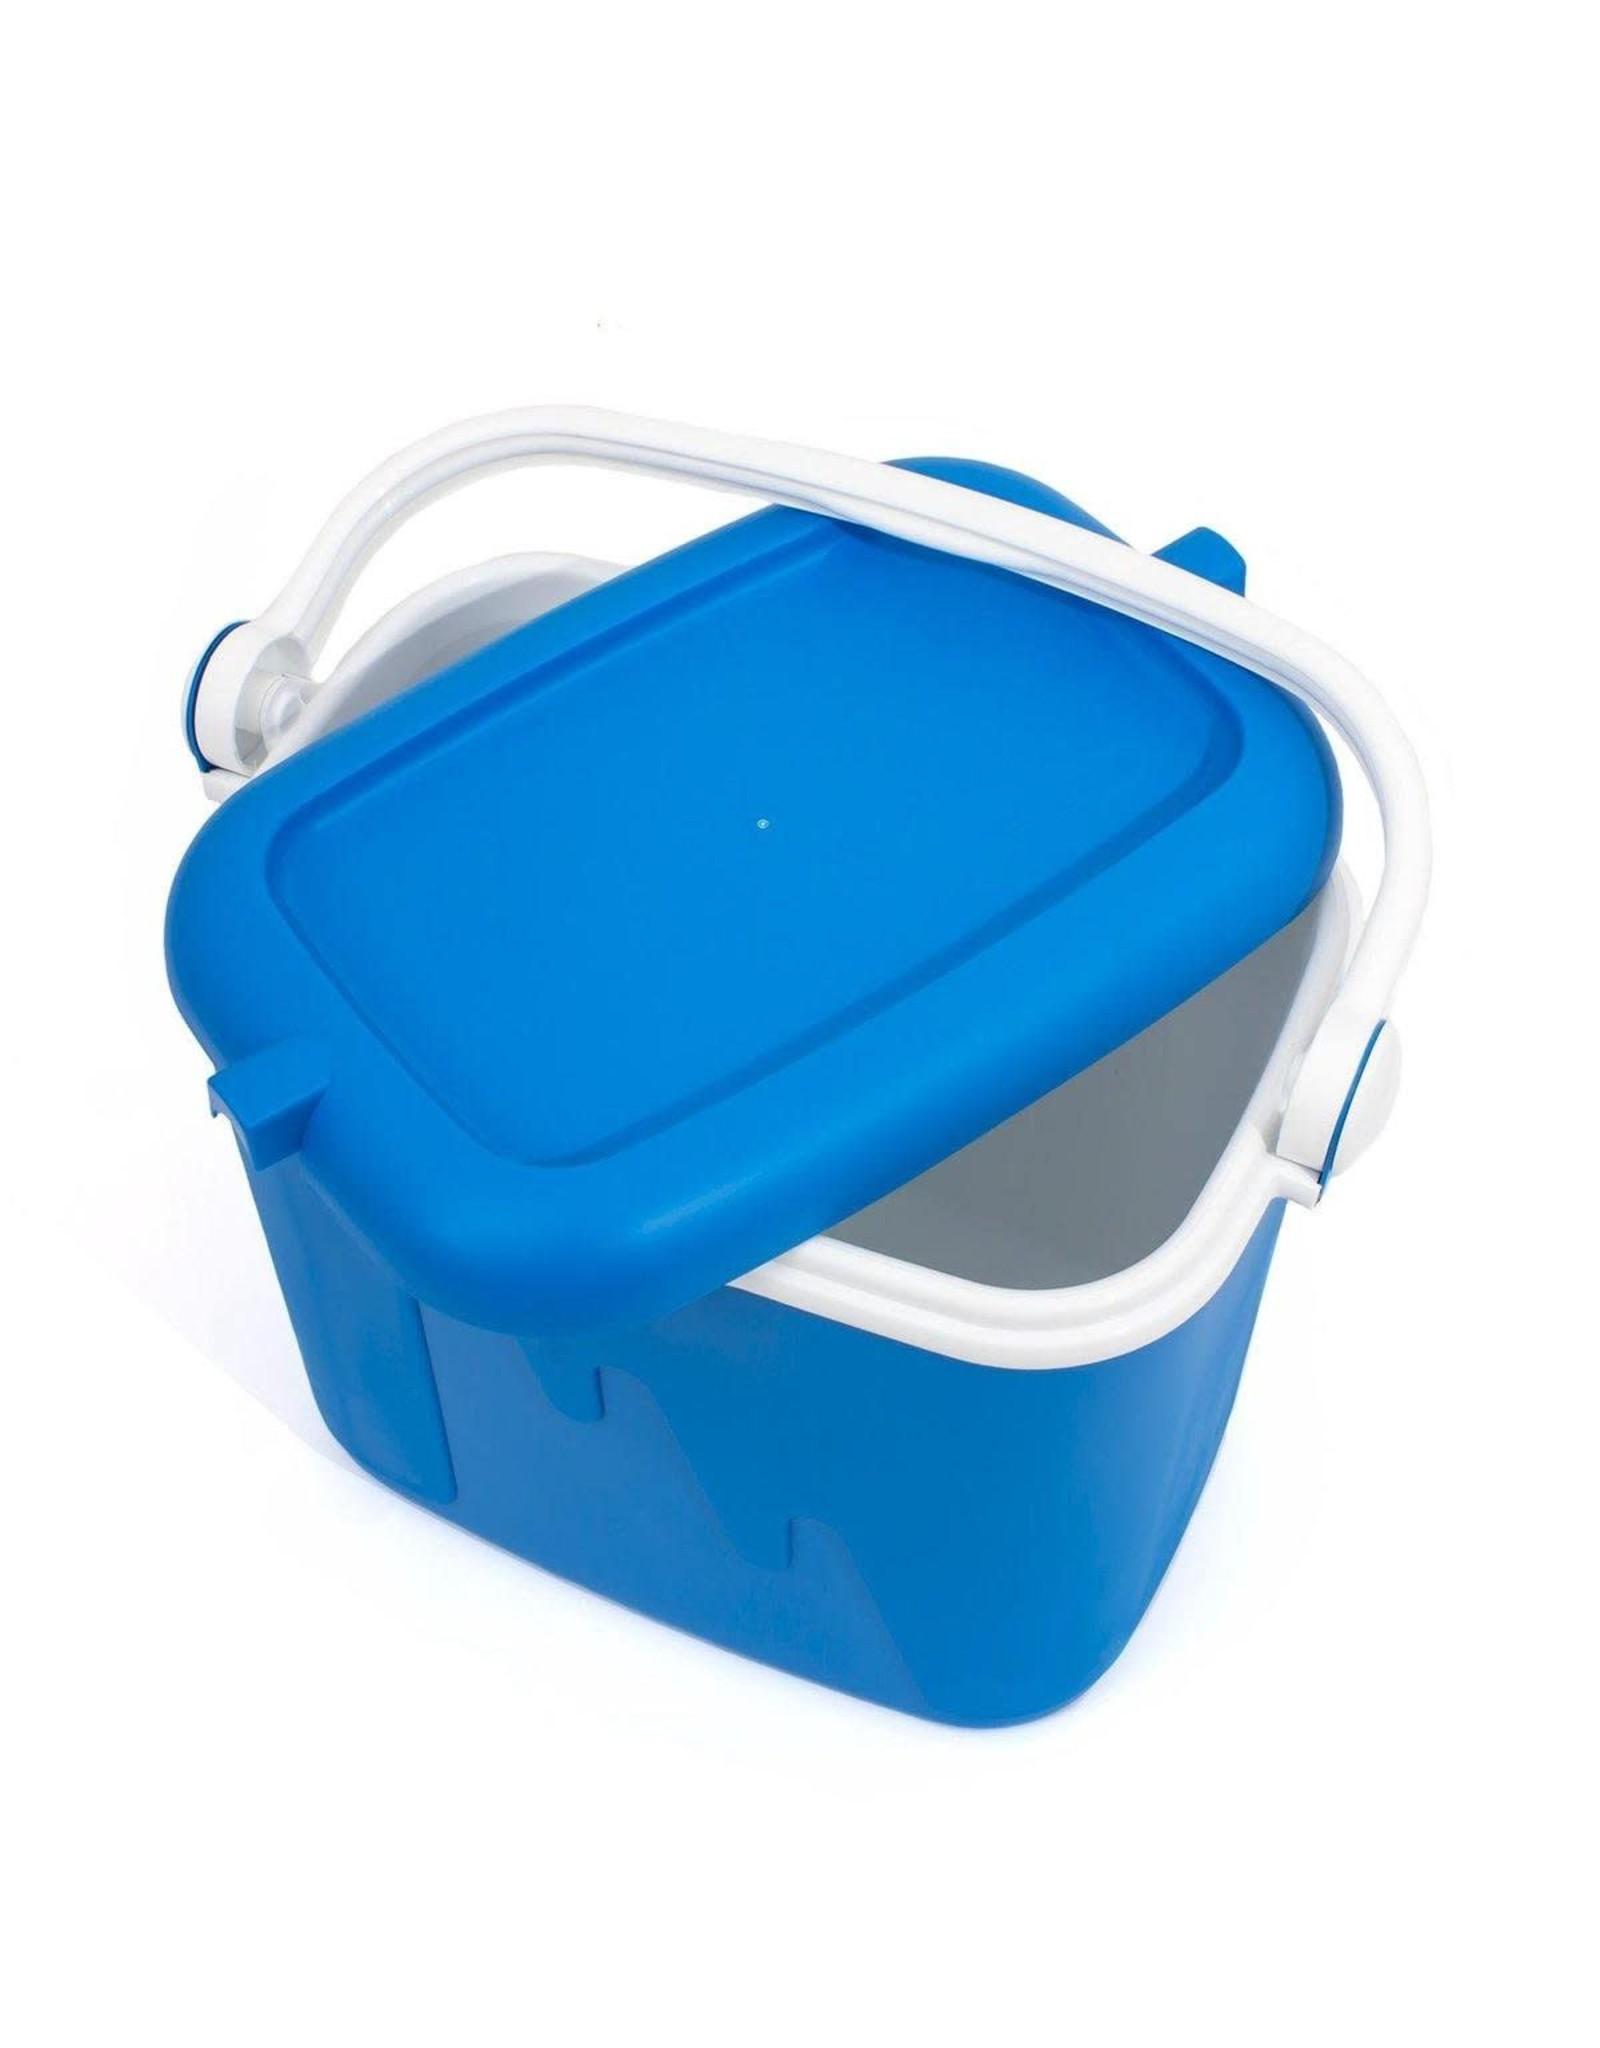 CURVER Curver Koelbox - Blauw - 32 Liter